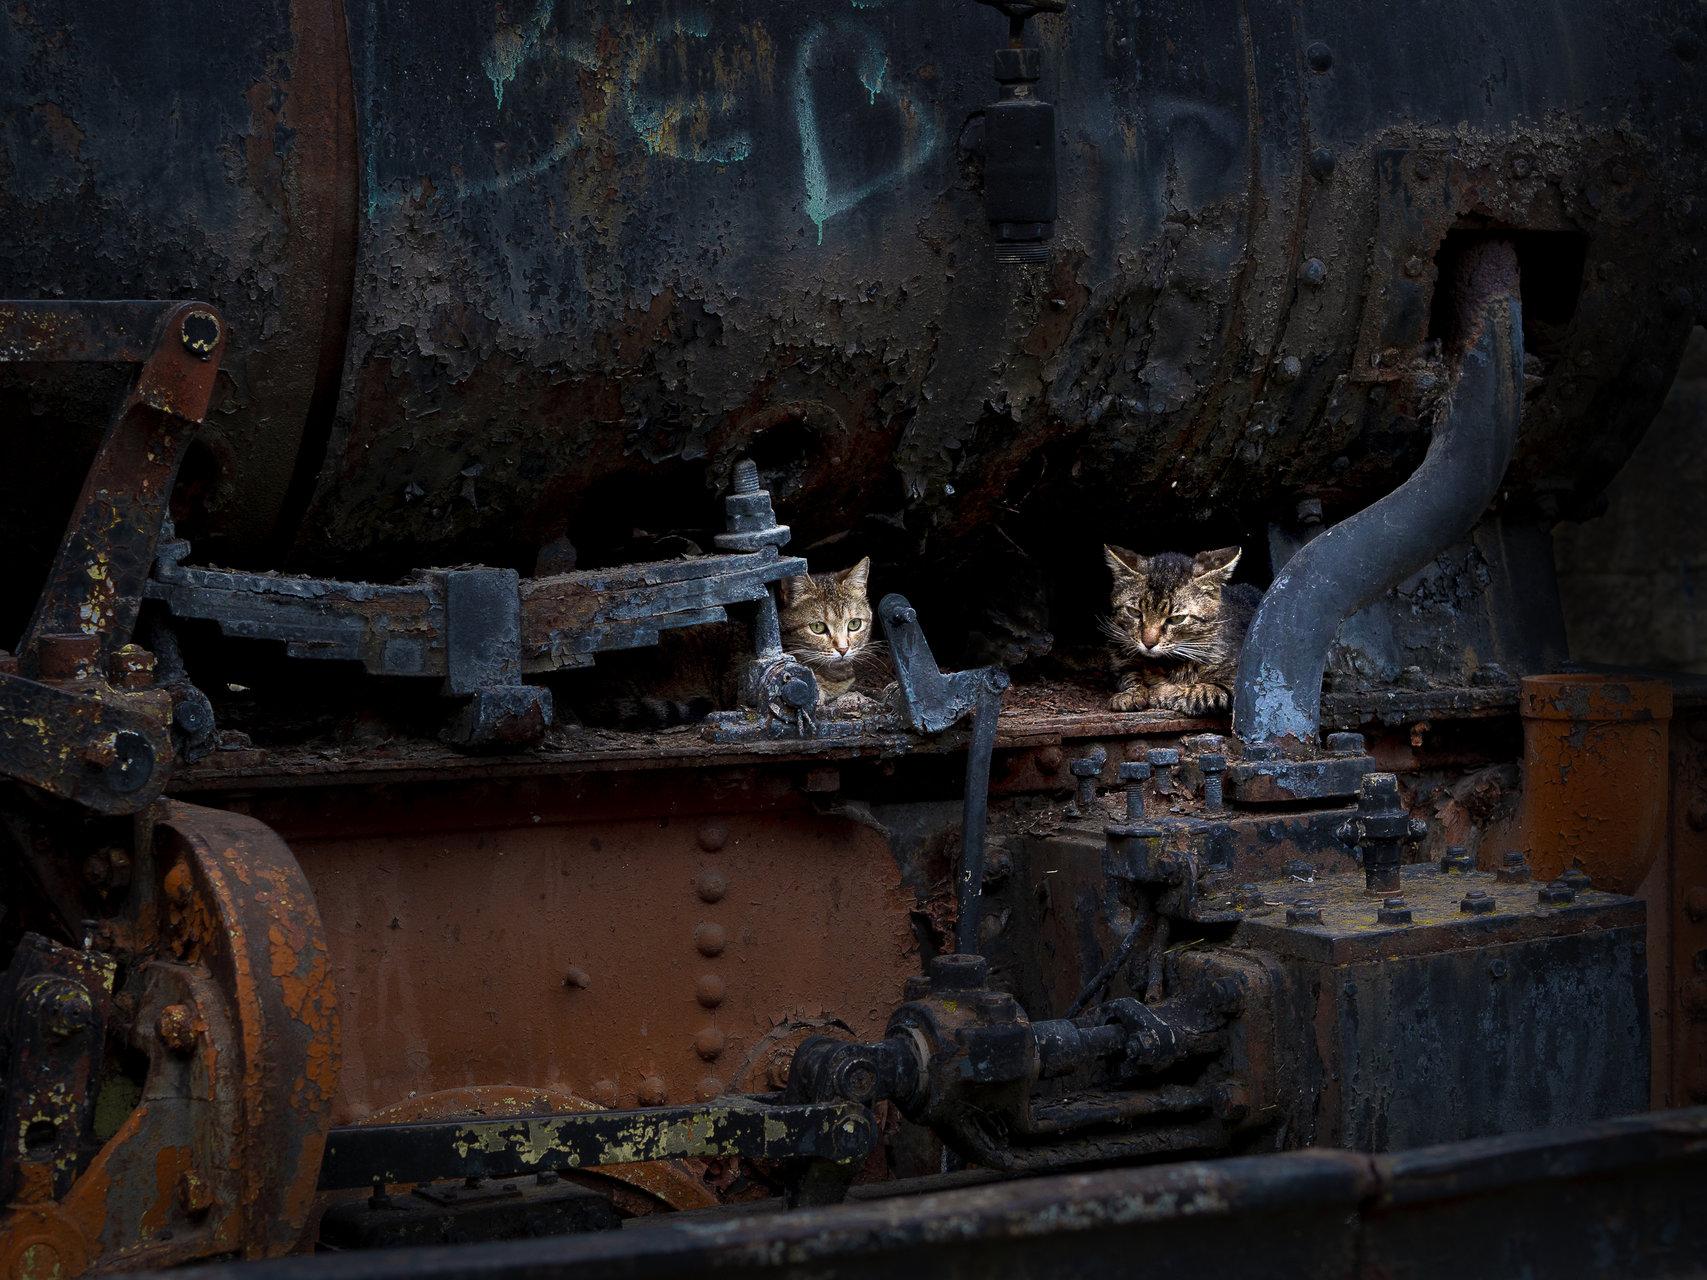 Плахите обитатели на старата вагонетка   Author мирела партинова - mirpar   PHOTO FORUM